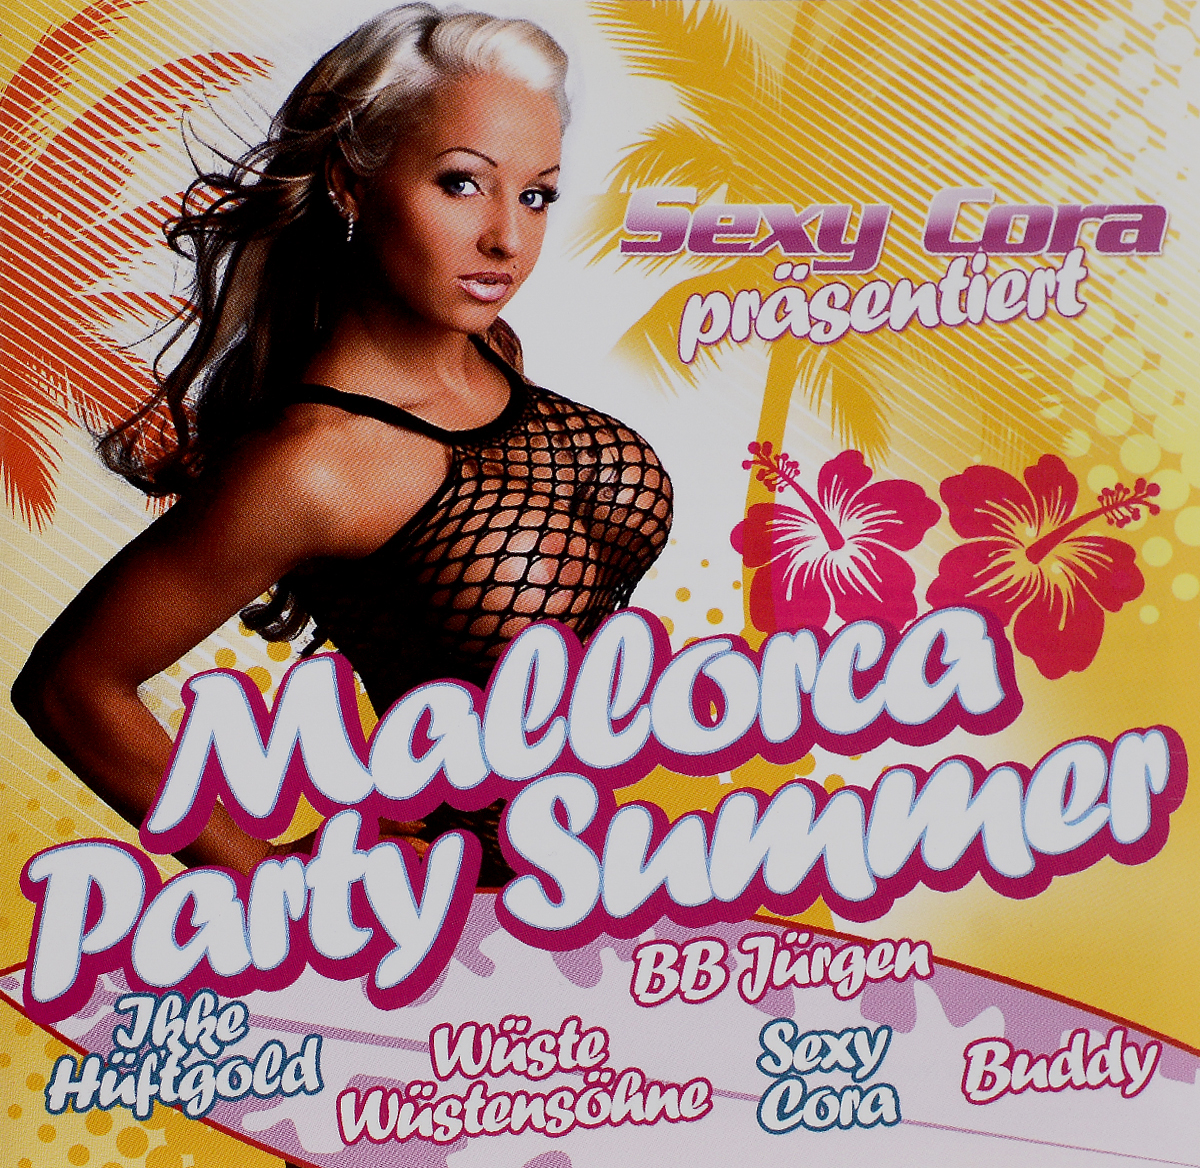 Michelmann Sexy Cora presents Mallorca Party Summer (2 CD) недорого